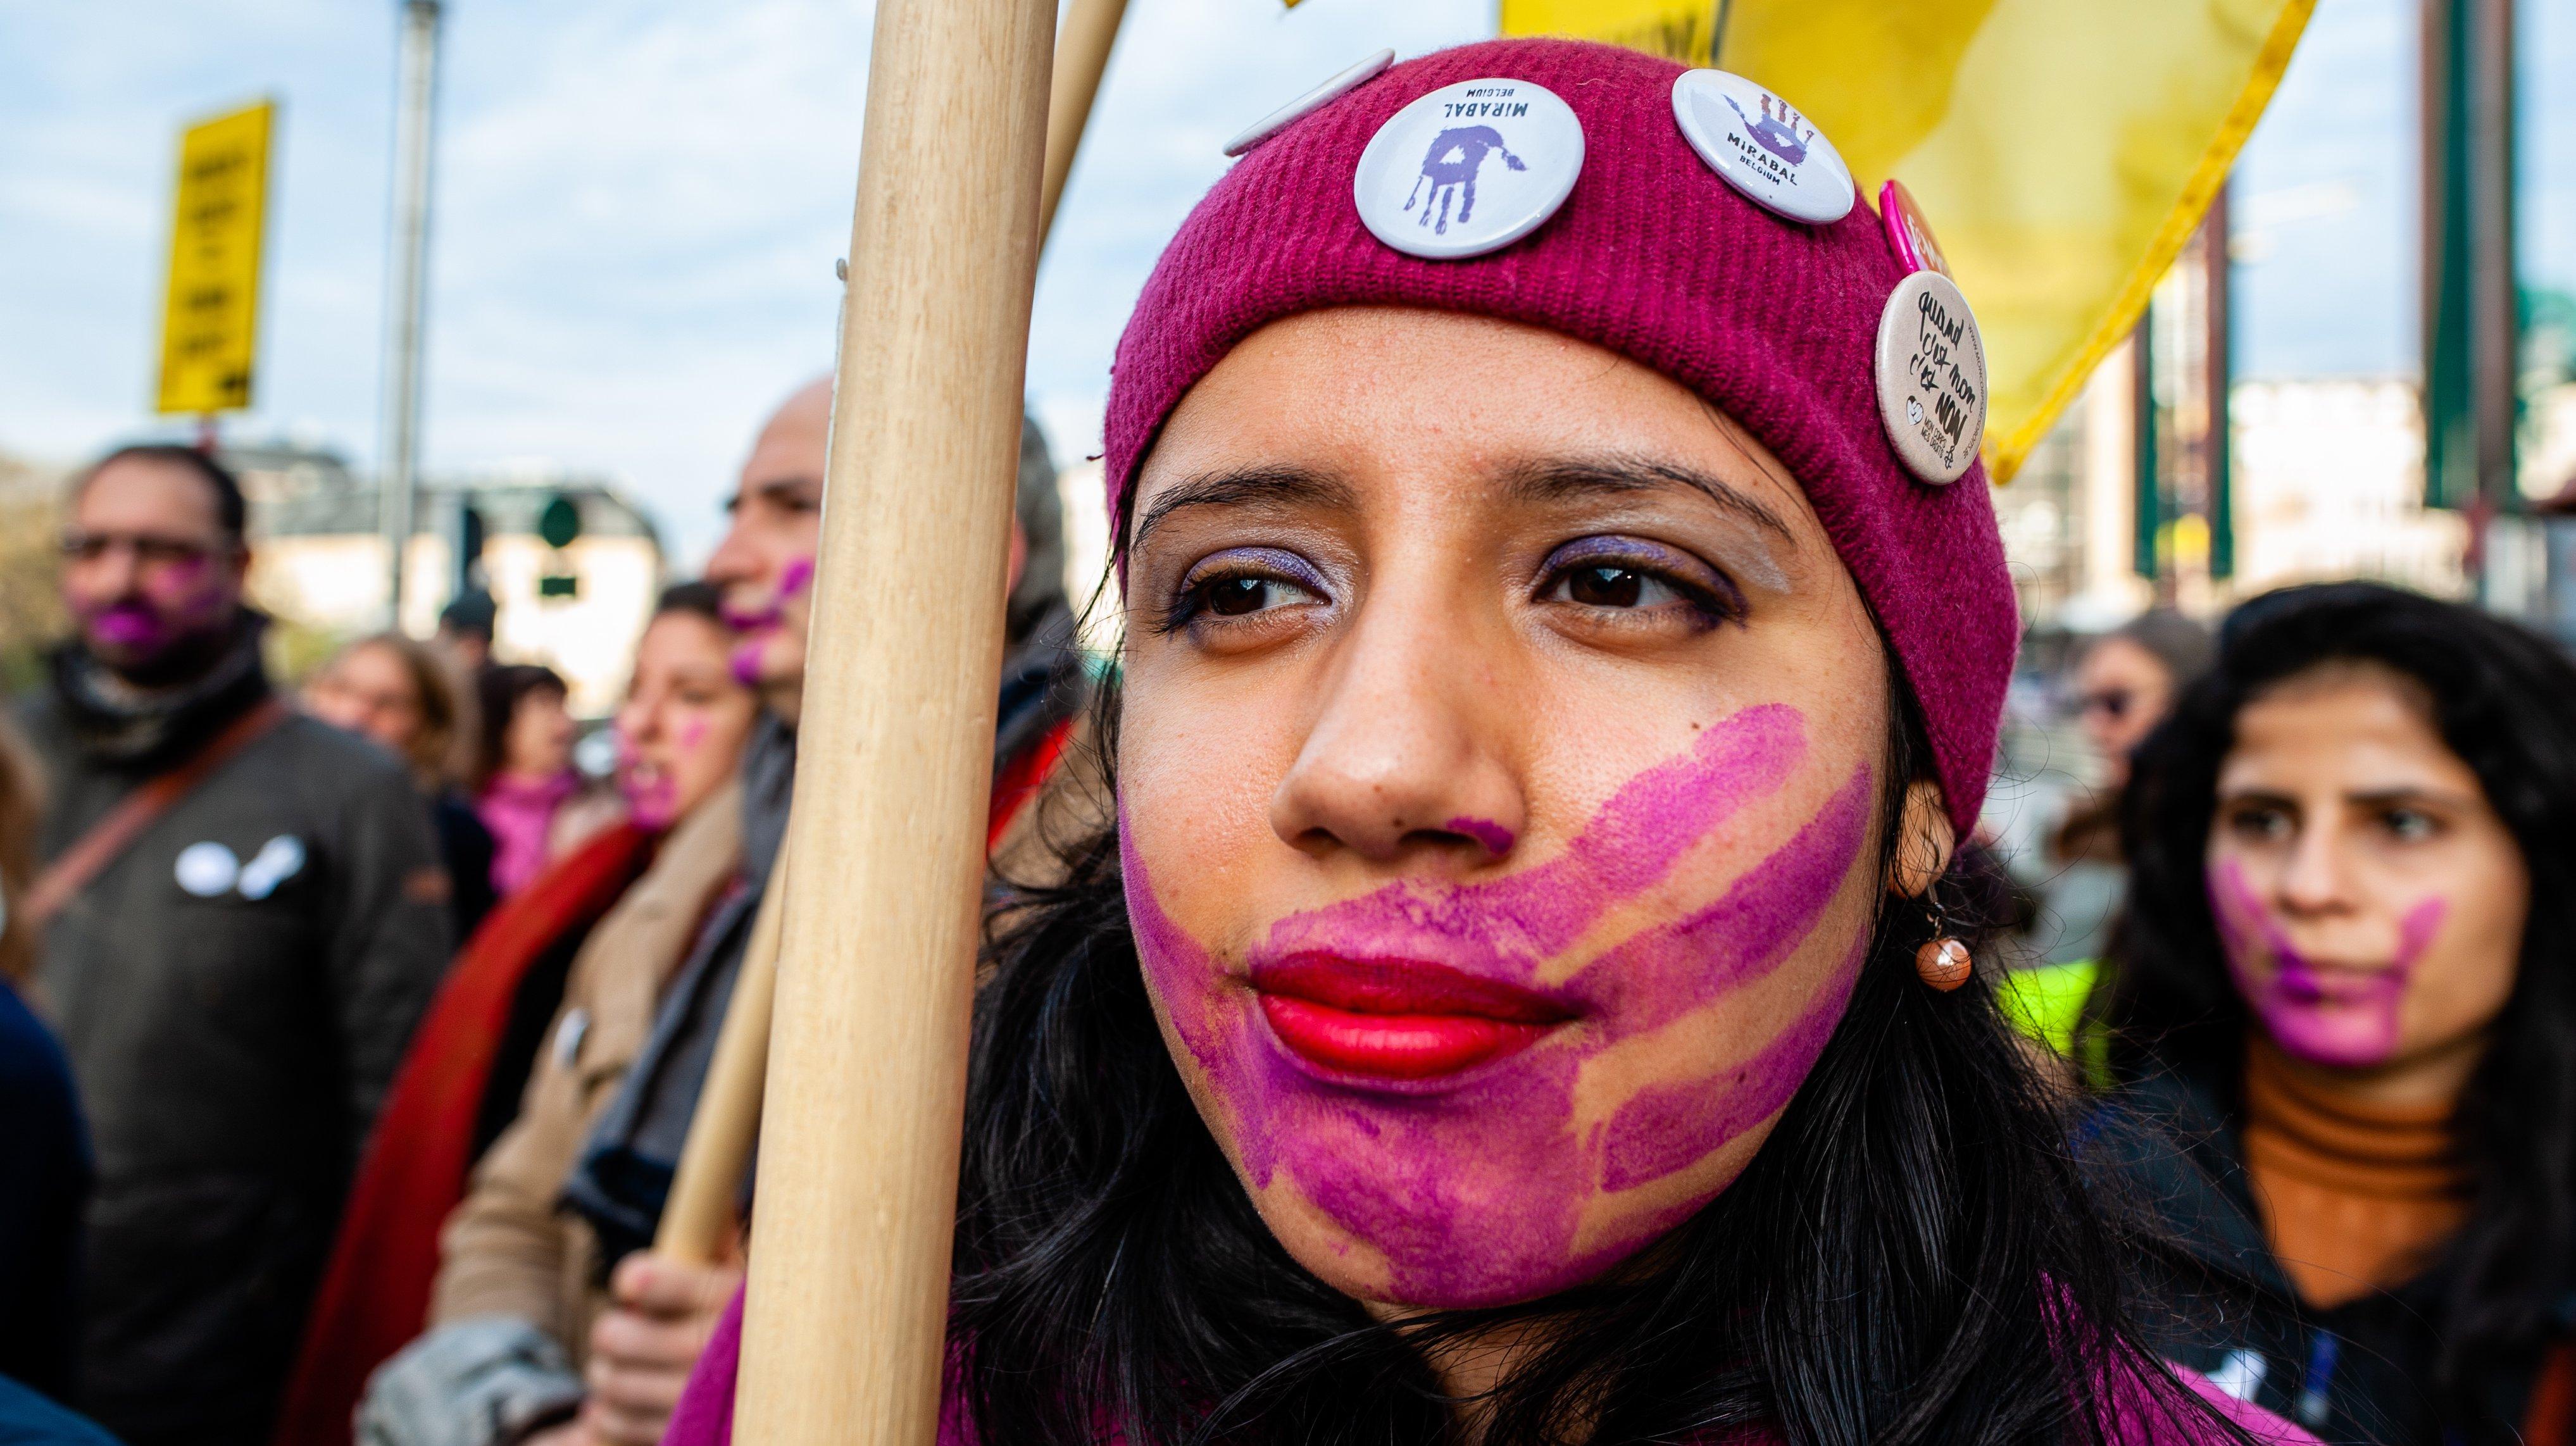 'Stop Violence Against Women' Demonstration In Brussels